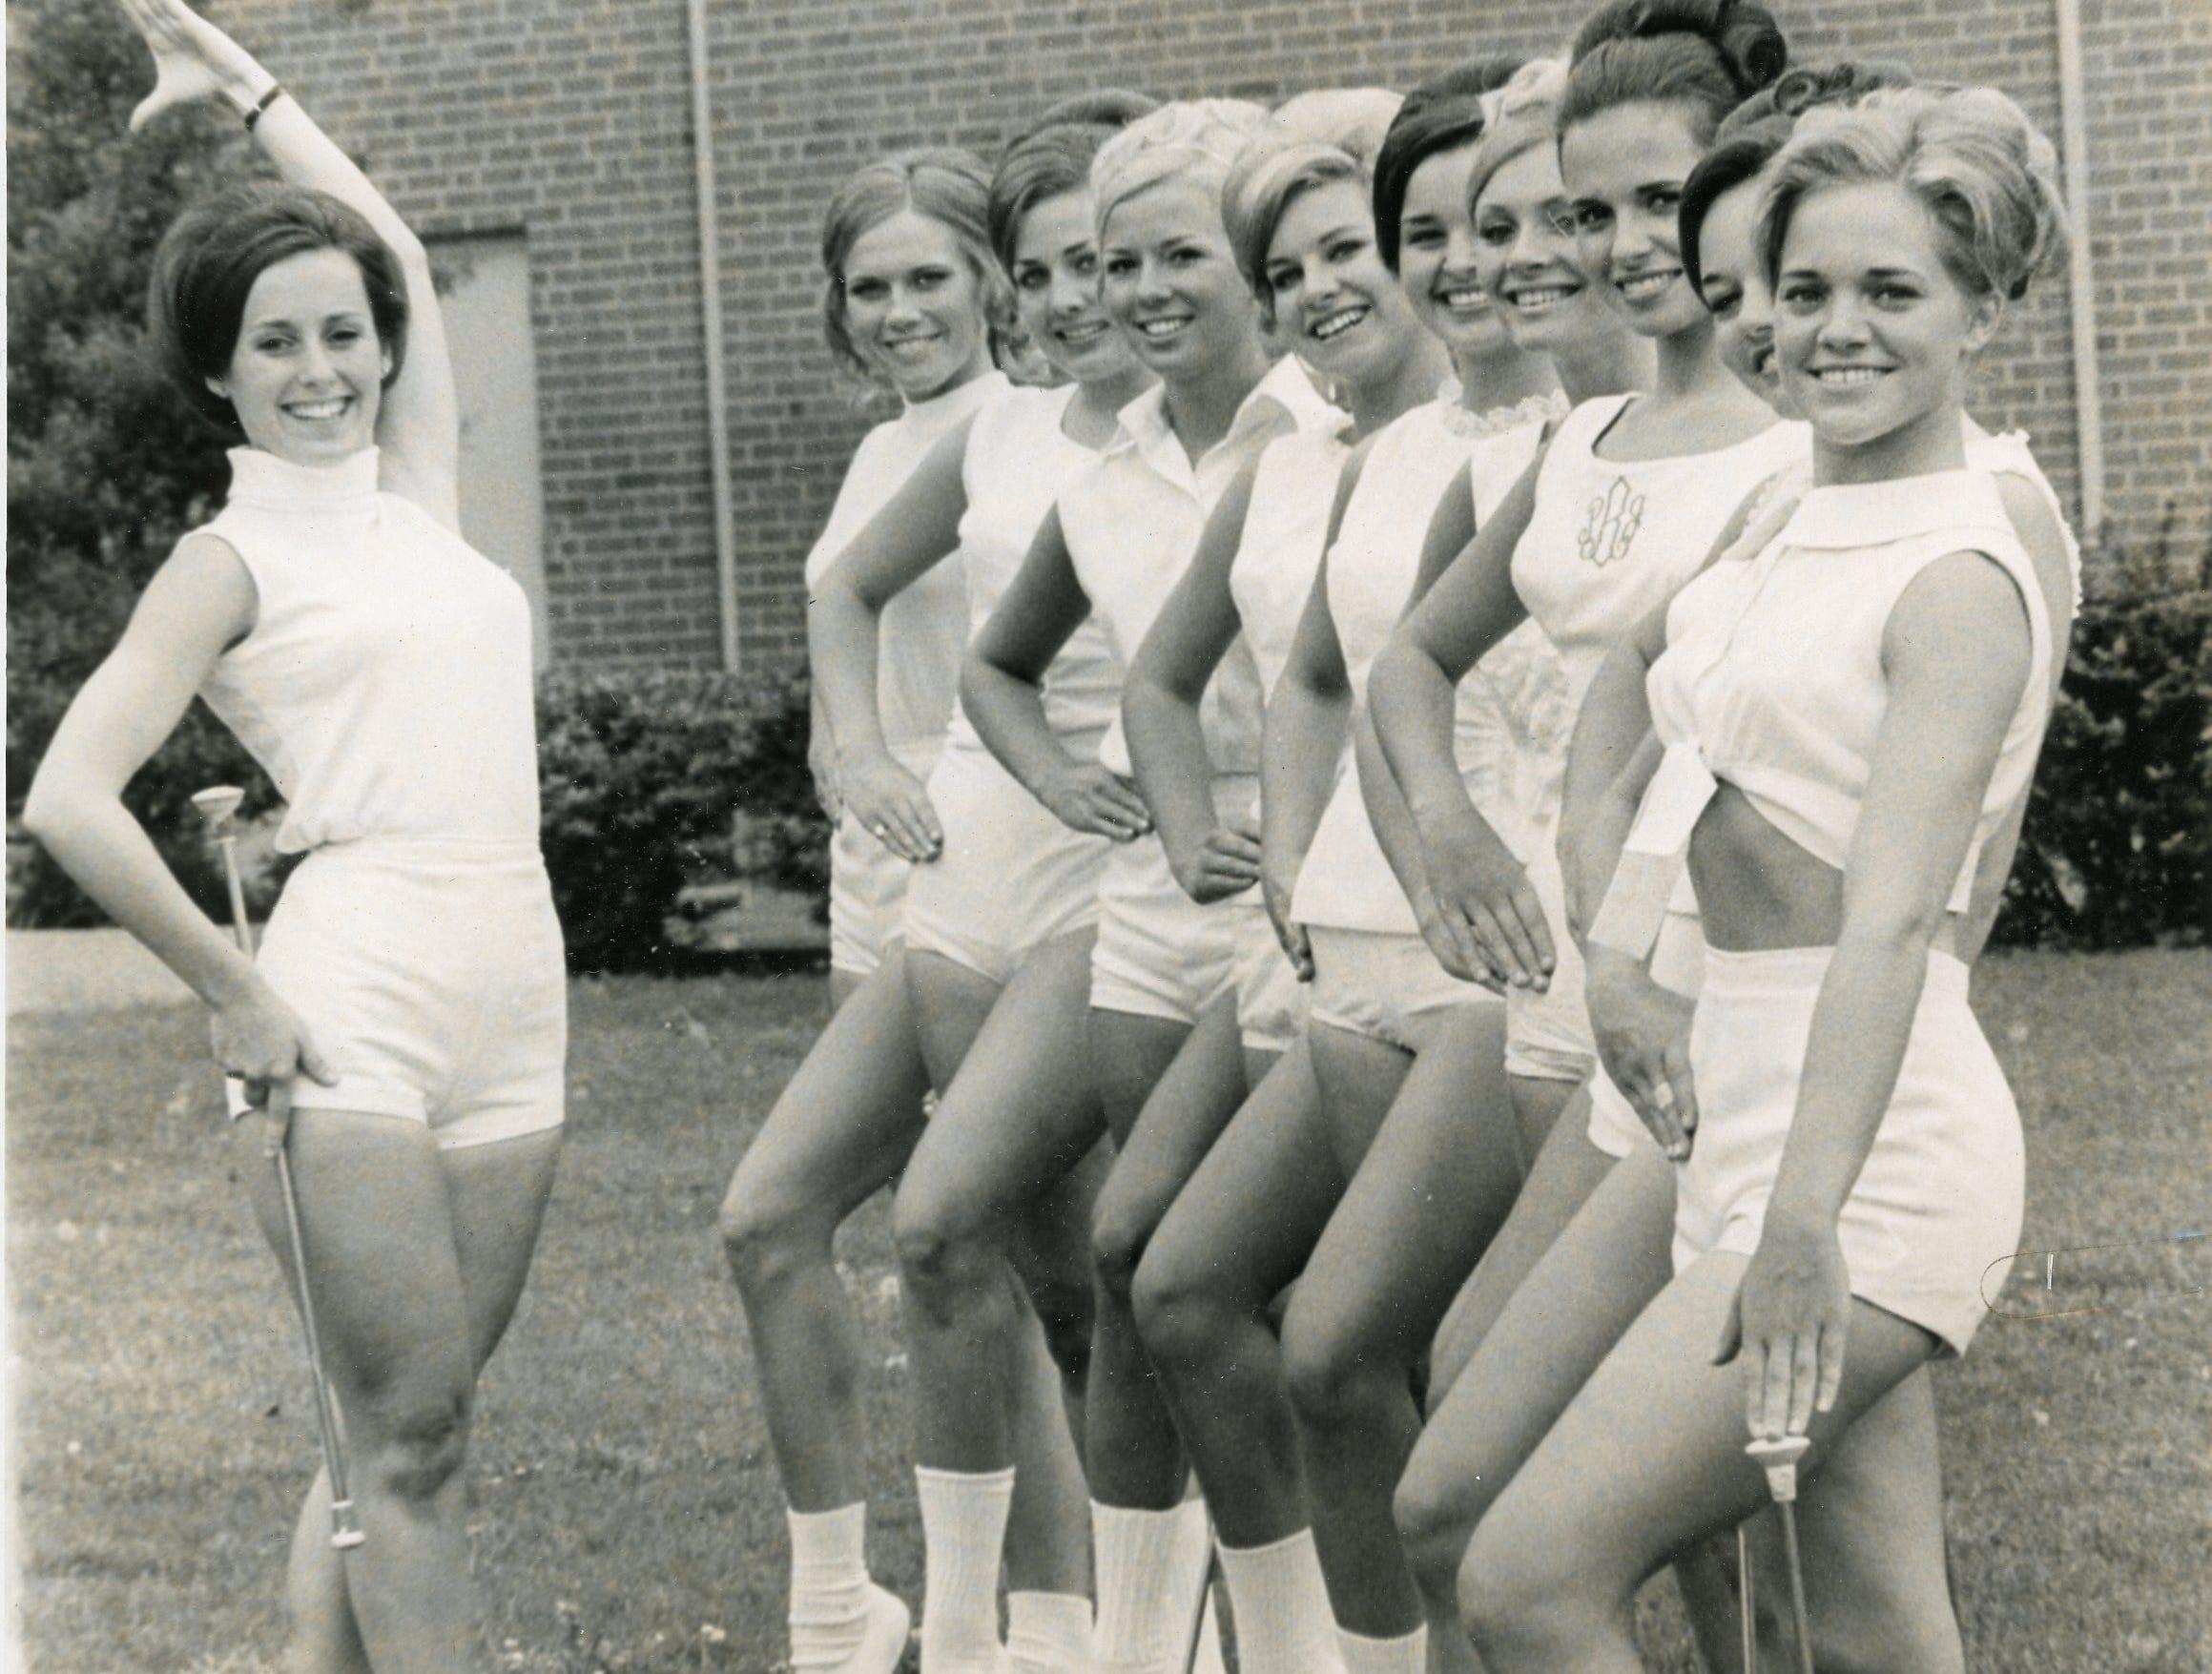 UT head majorette Pete Payne with Gail Noe, Deborah Holiday, Donna McKibbin, Kathy McCarrell, Gail Love, Karen Oakes, Suzanne Minchey, Karen Crumm and Susan Douglas. 1970.